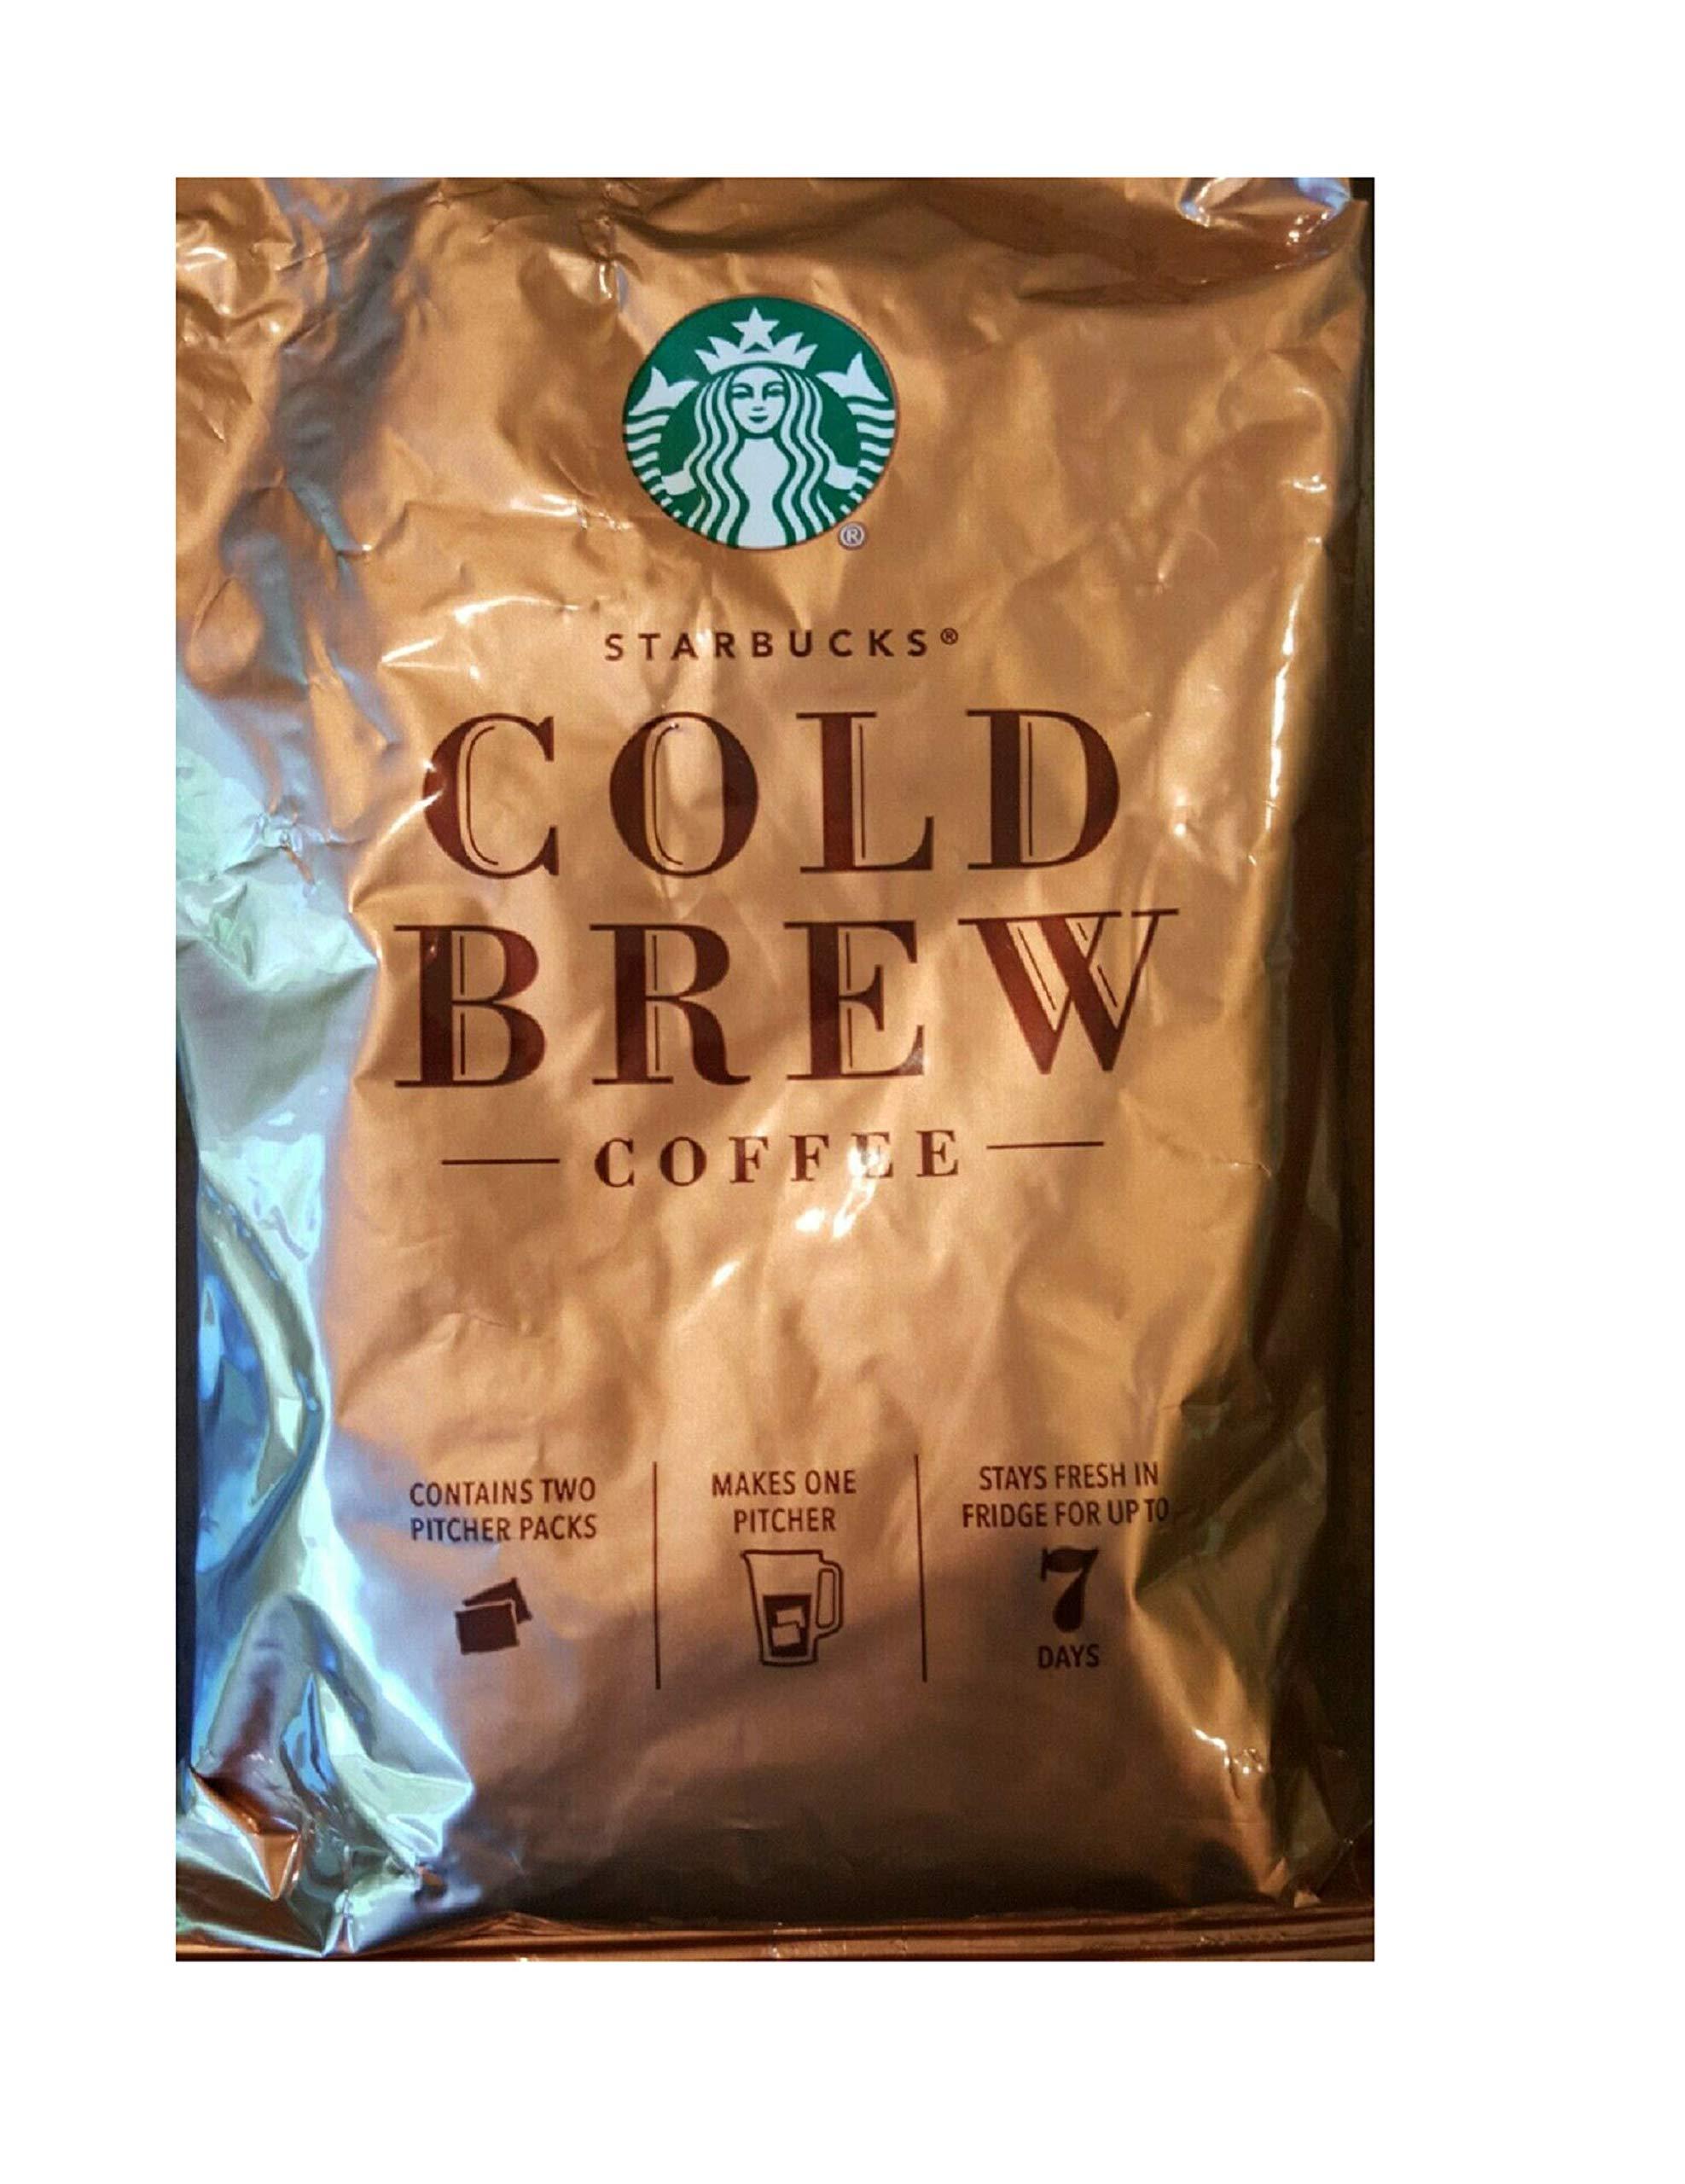 Starbucks Cold Brew Coffee, Medium Roast Coffee, 8.6 Oz. (Makes 10 Pitchers)